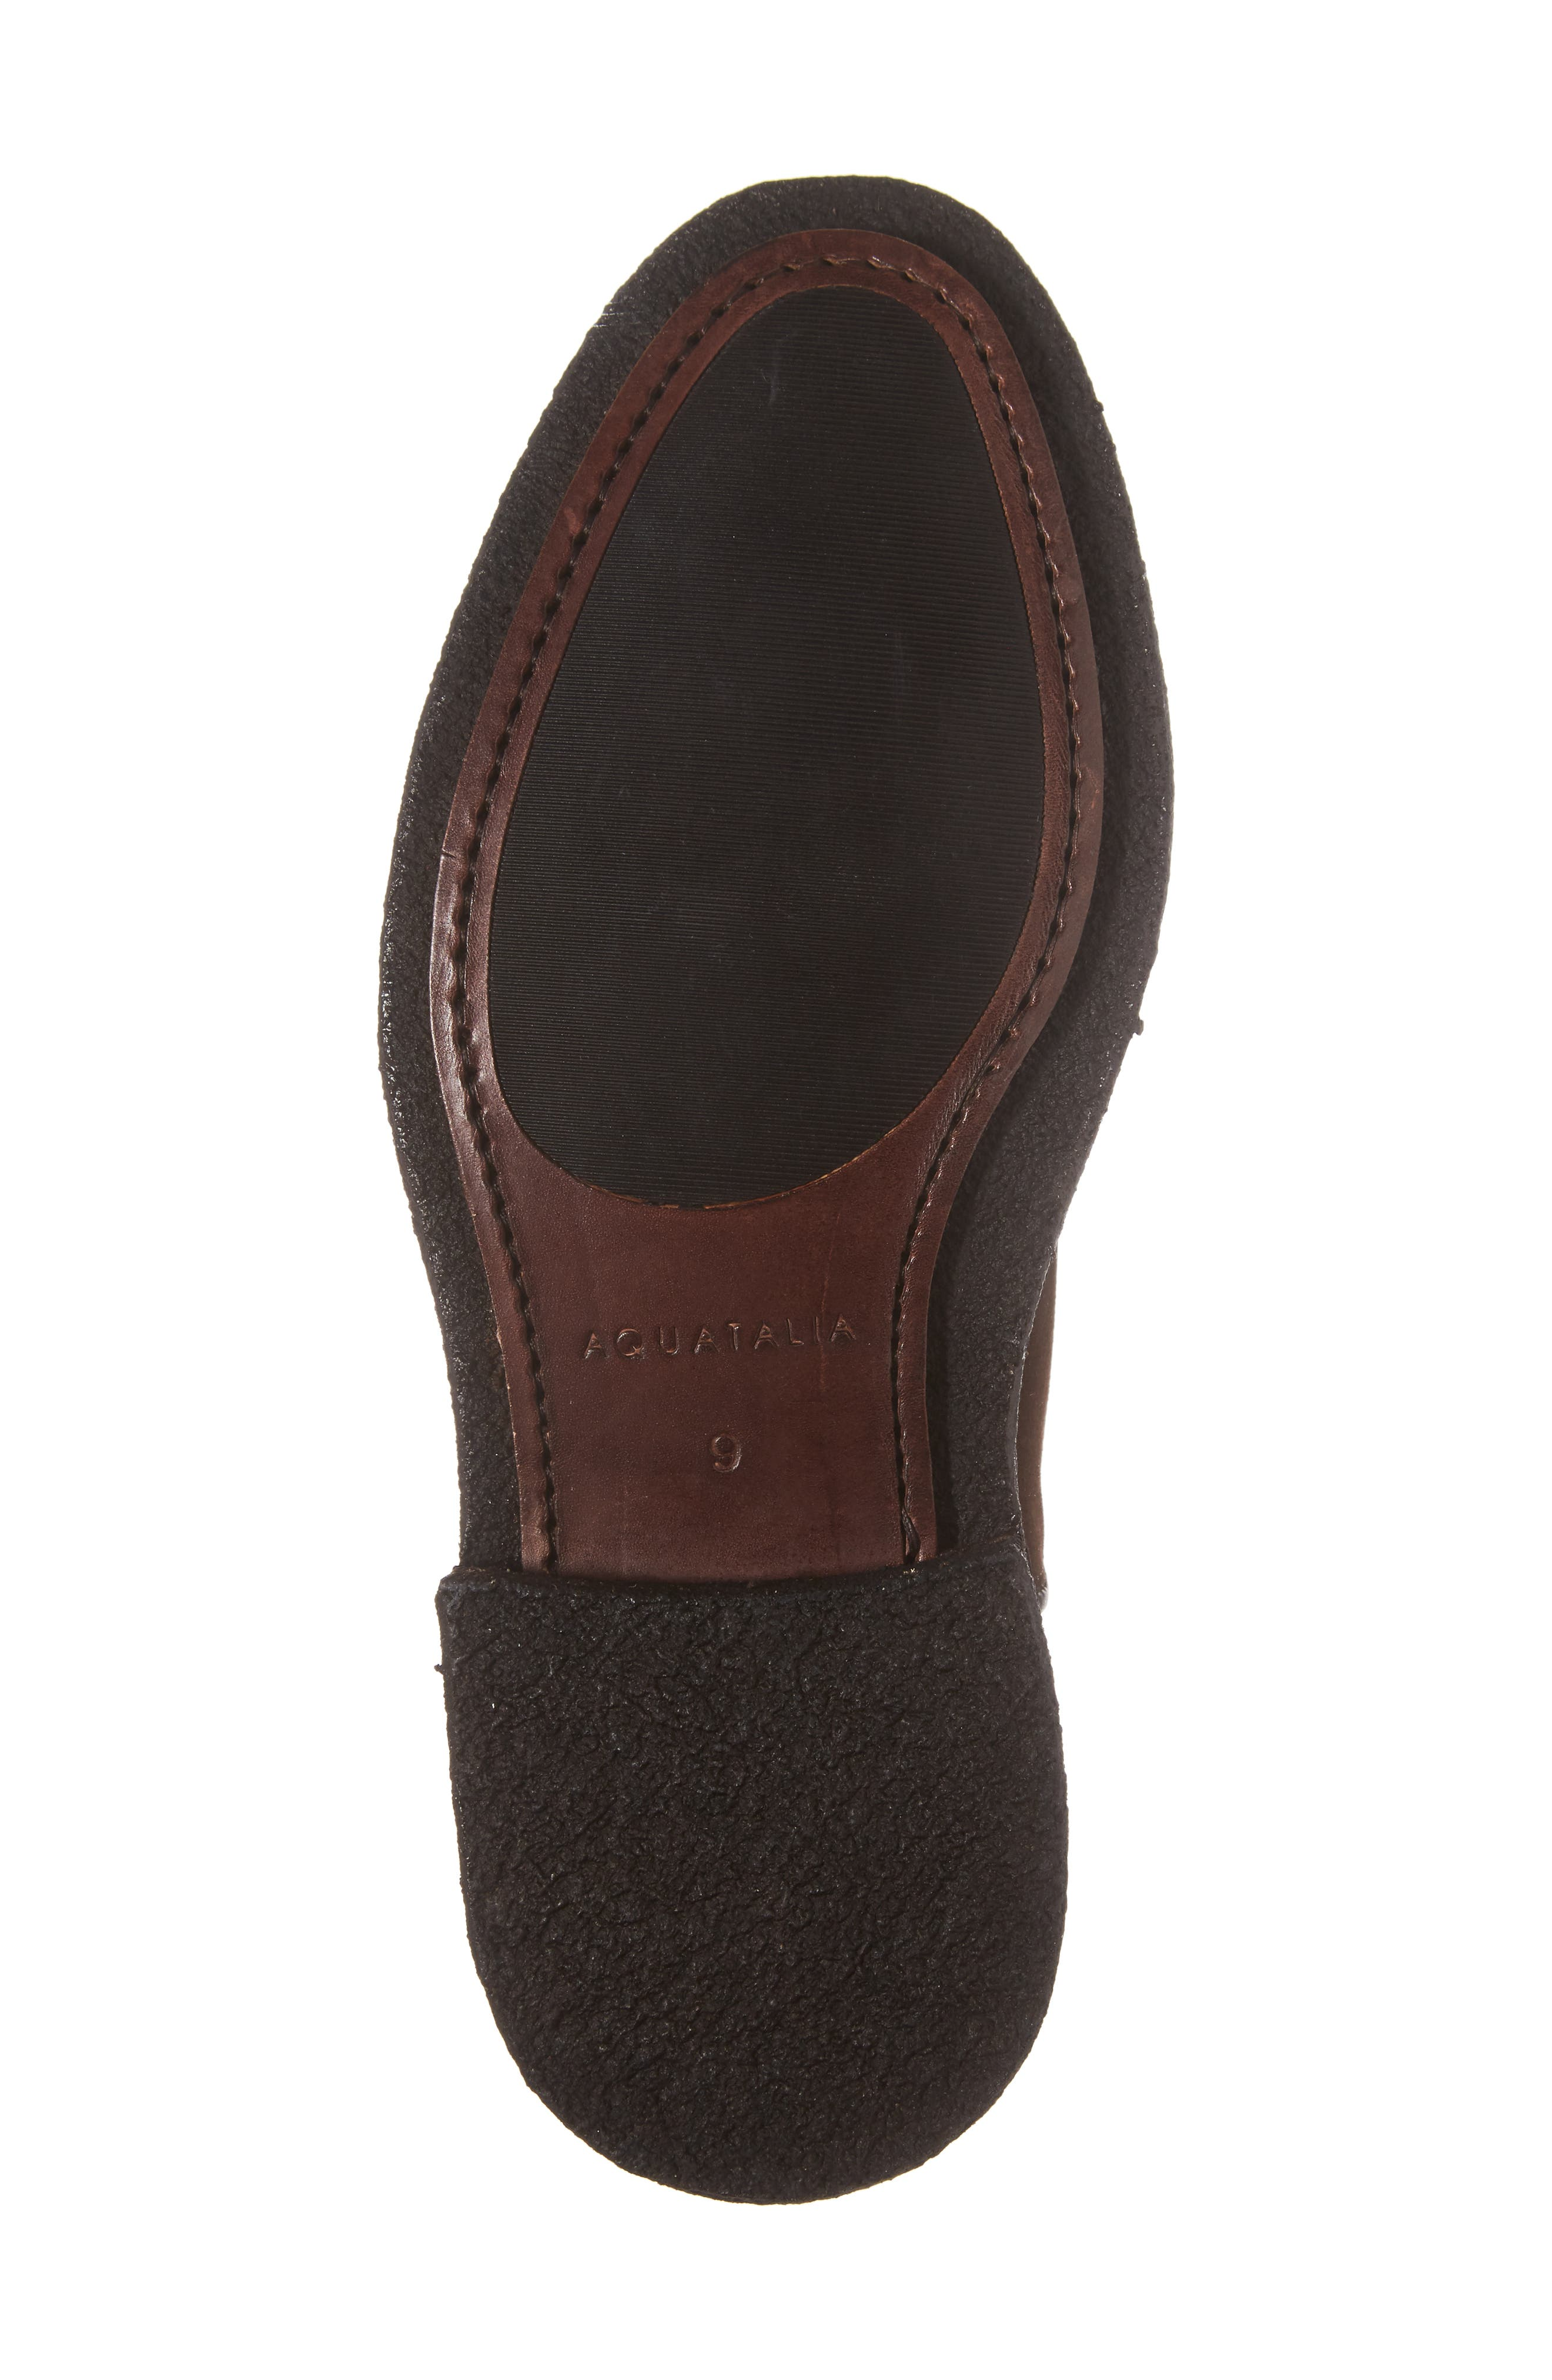 Oscar Chelsea Boot,                             Alternate thumbnail 6, color,                             Medium Brown